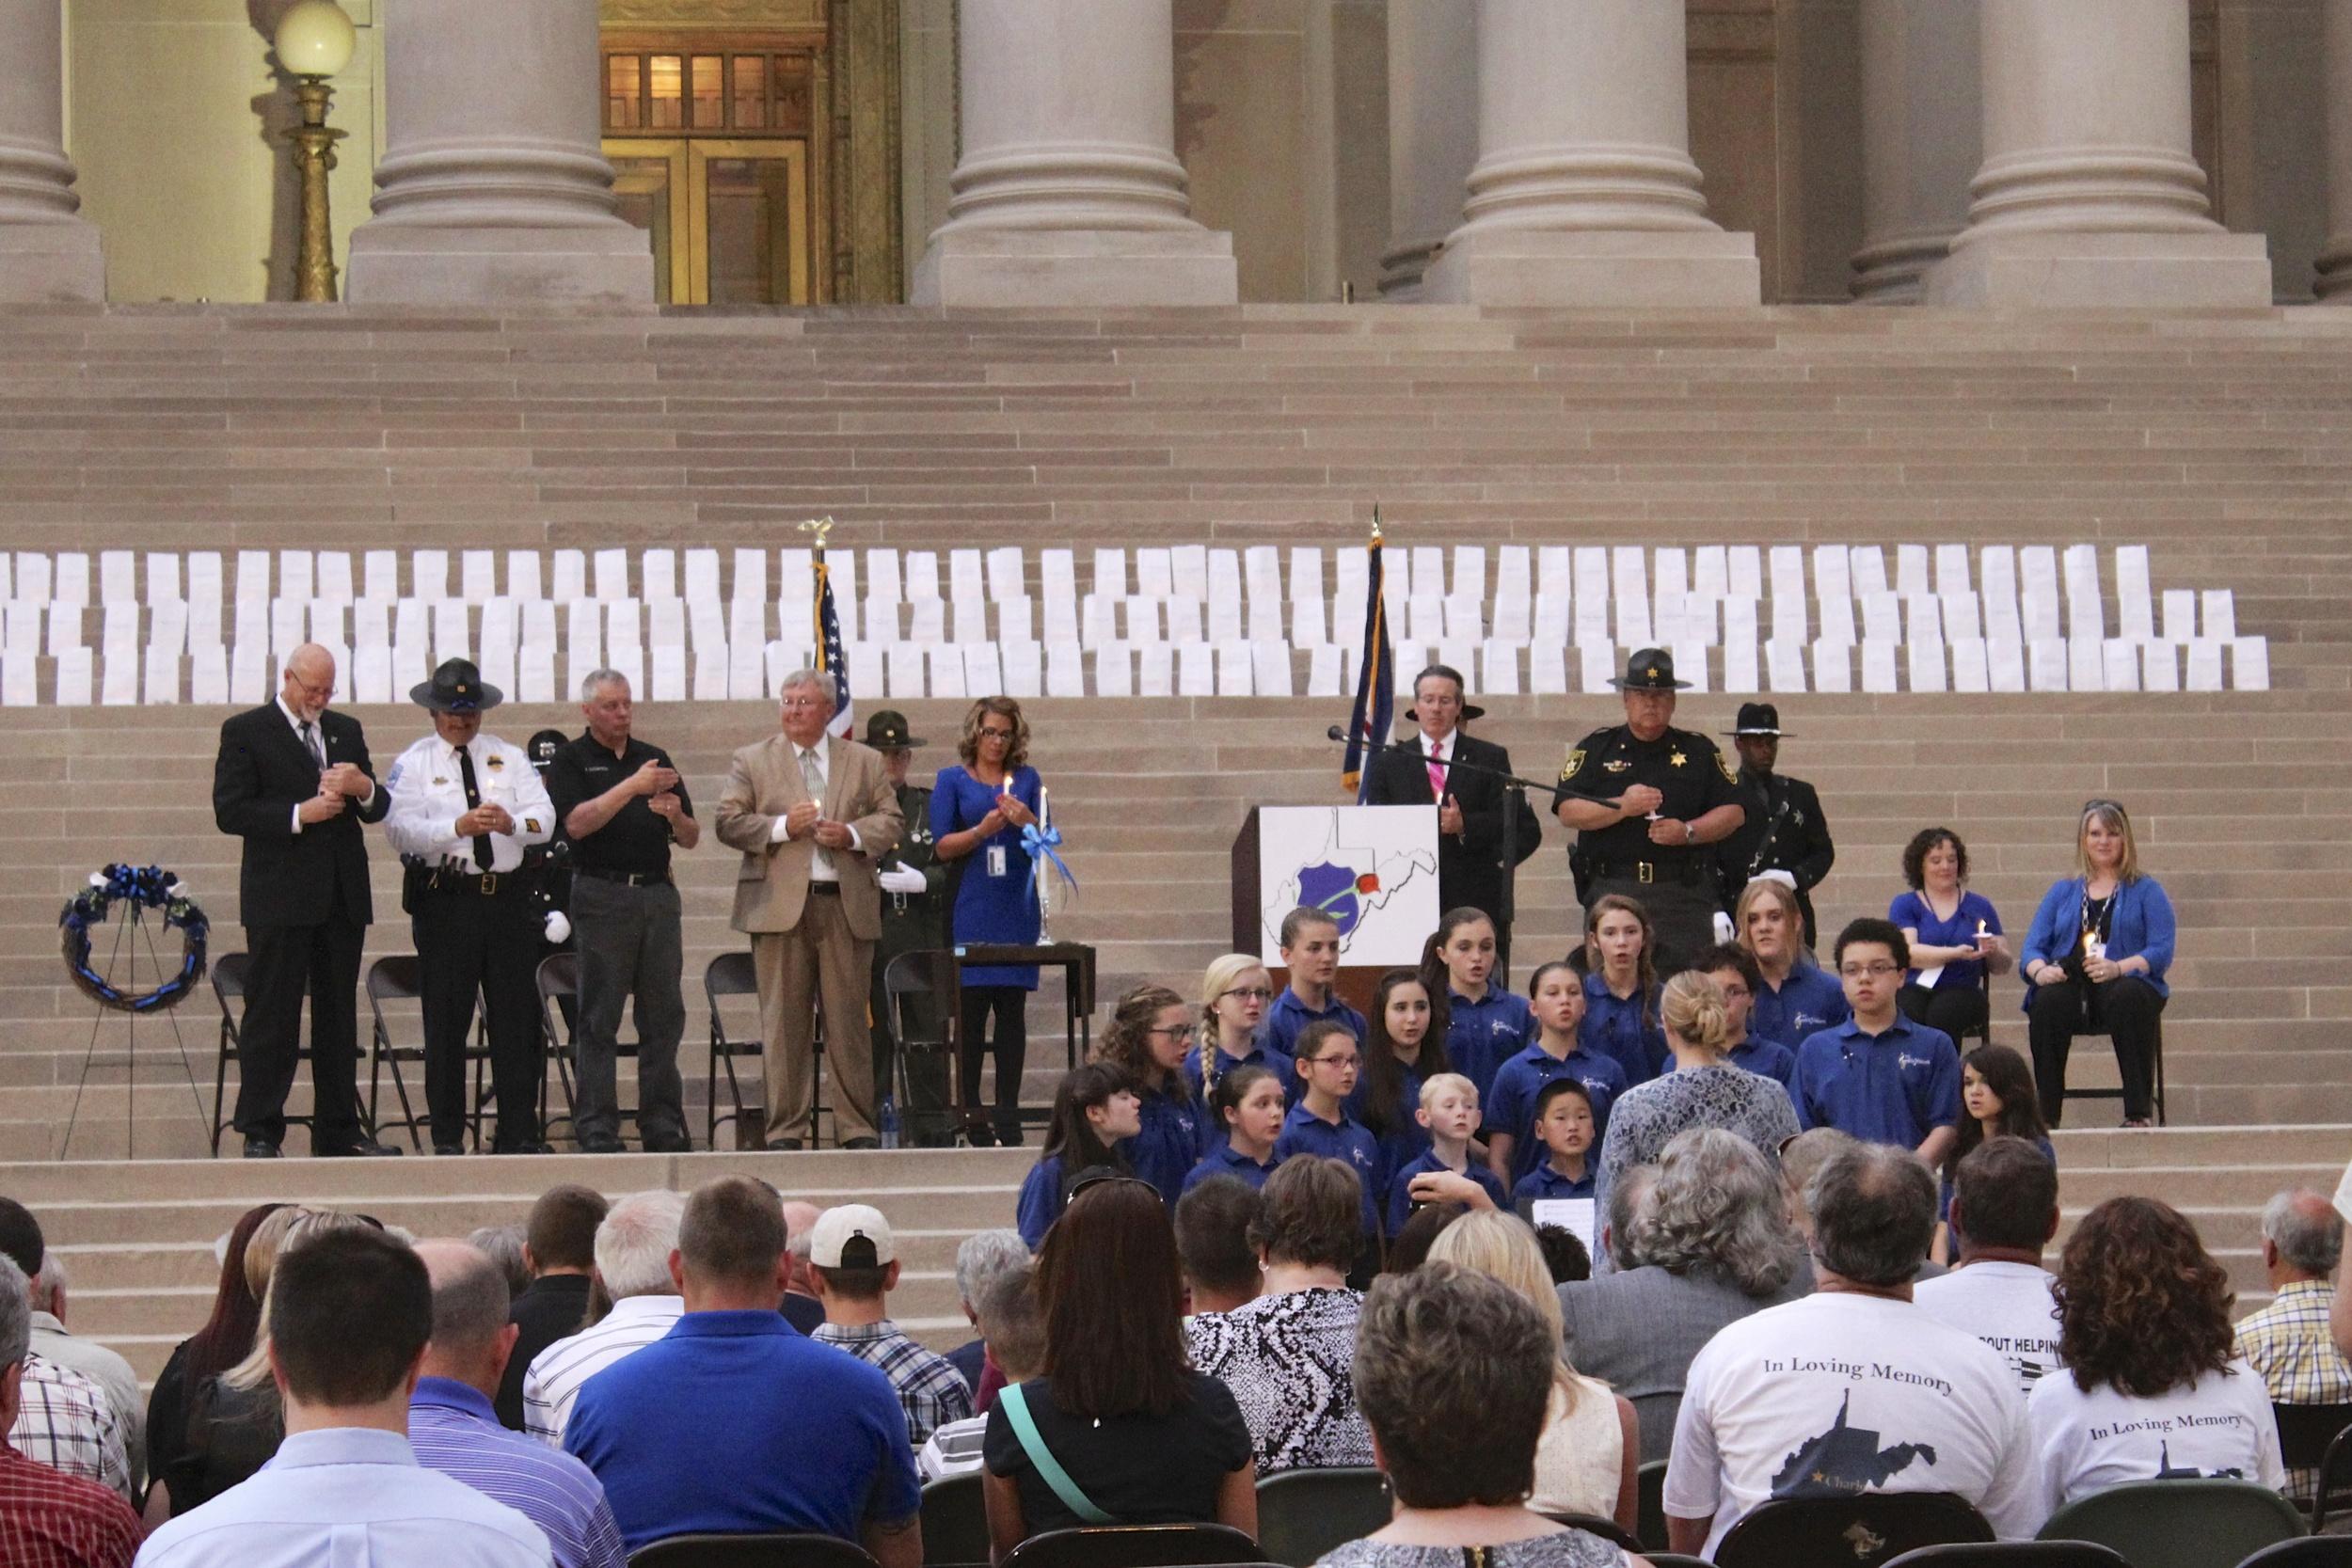 WV Fallen Police Officer Ceremony, WV State Capitol, 5/13/14